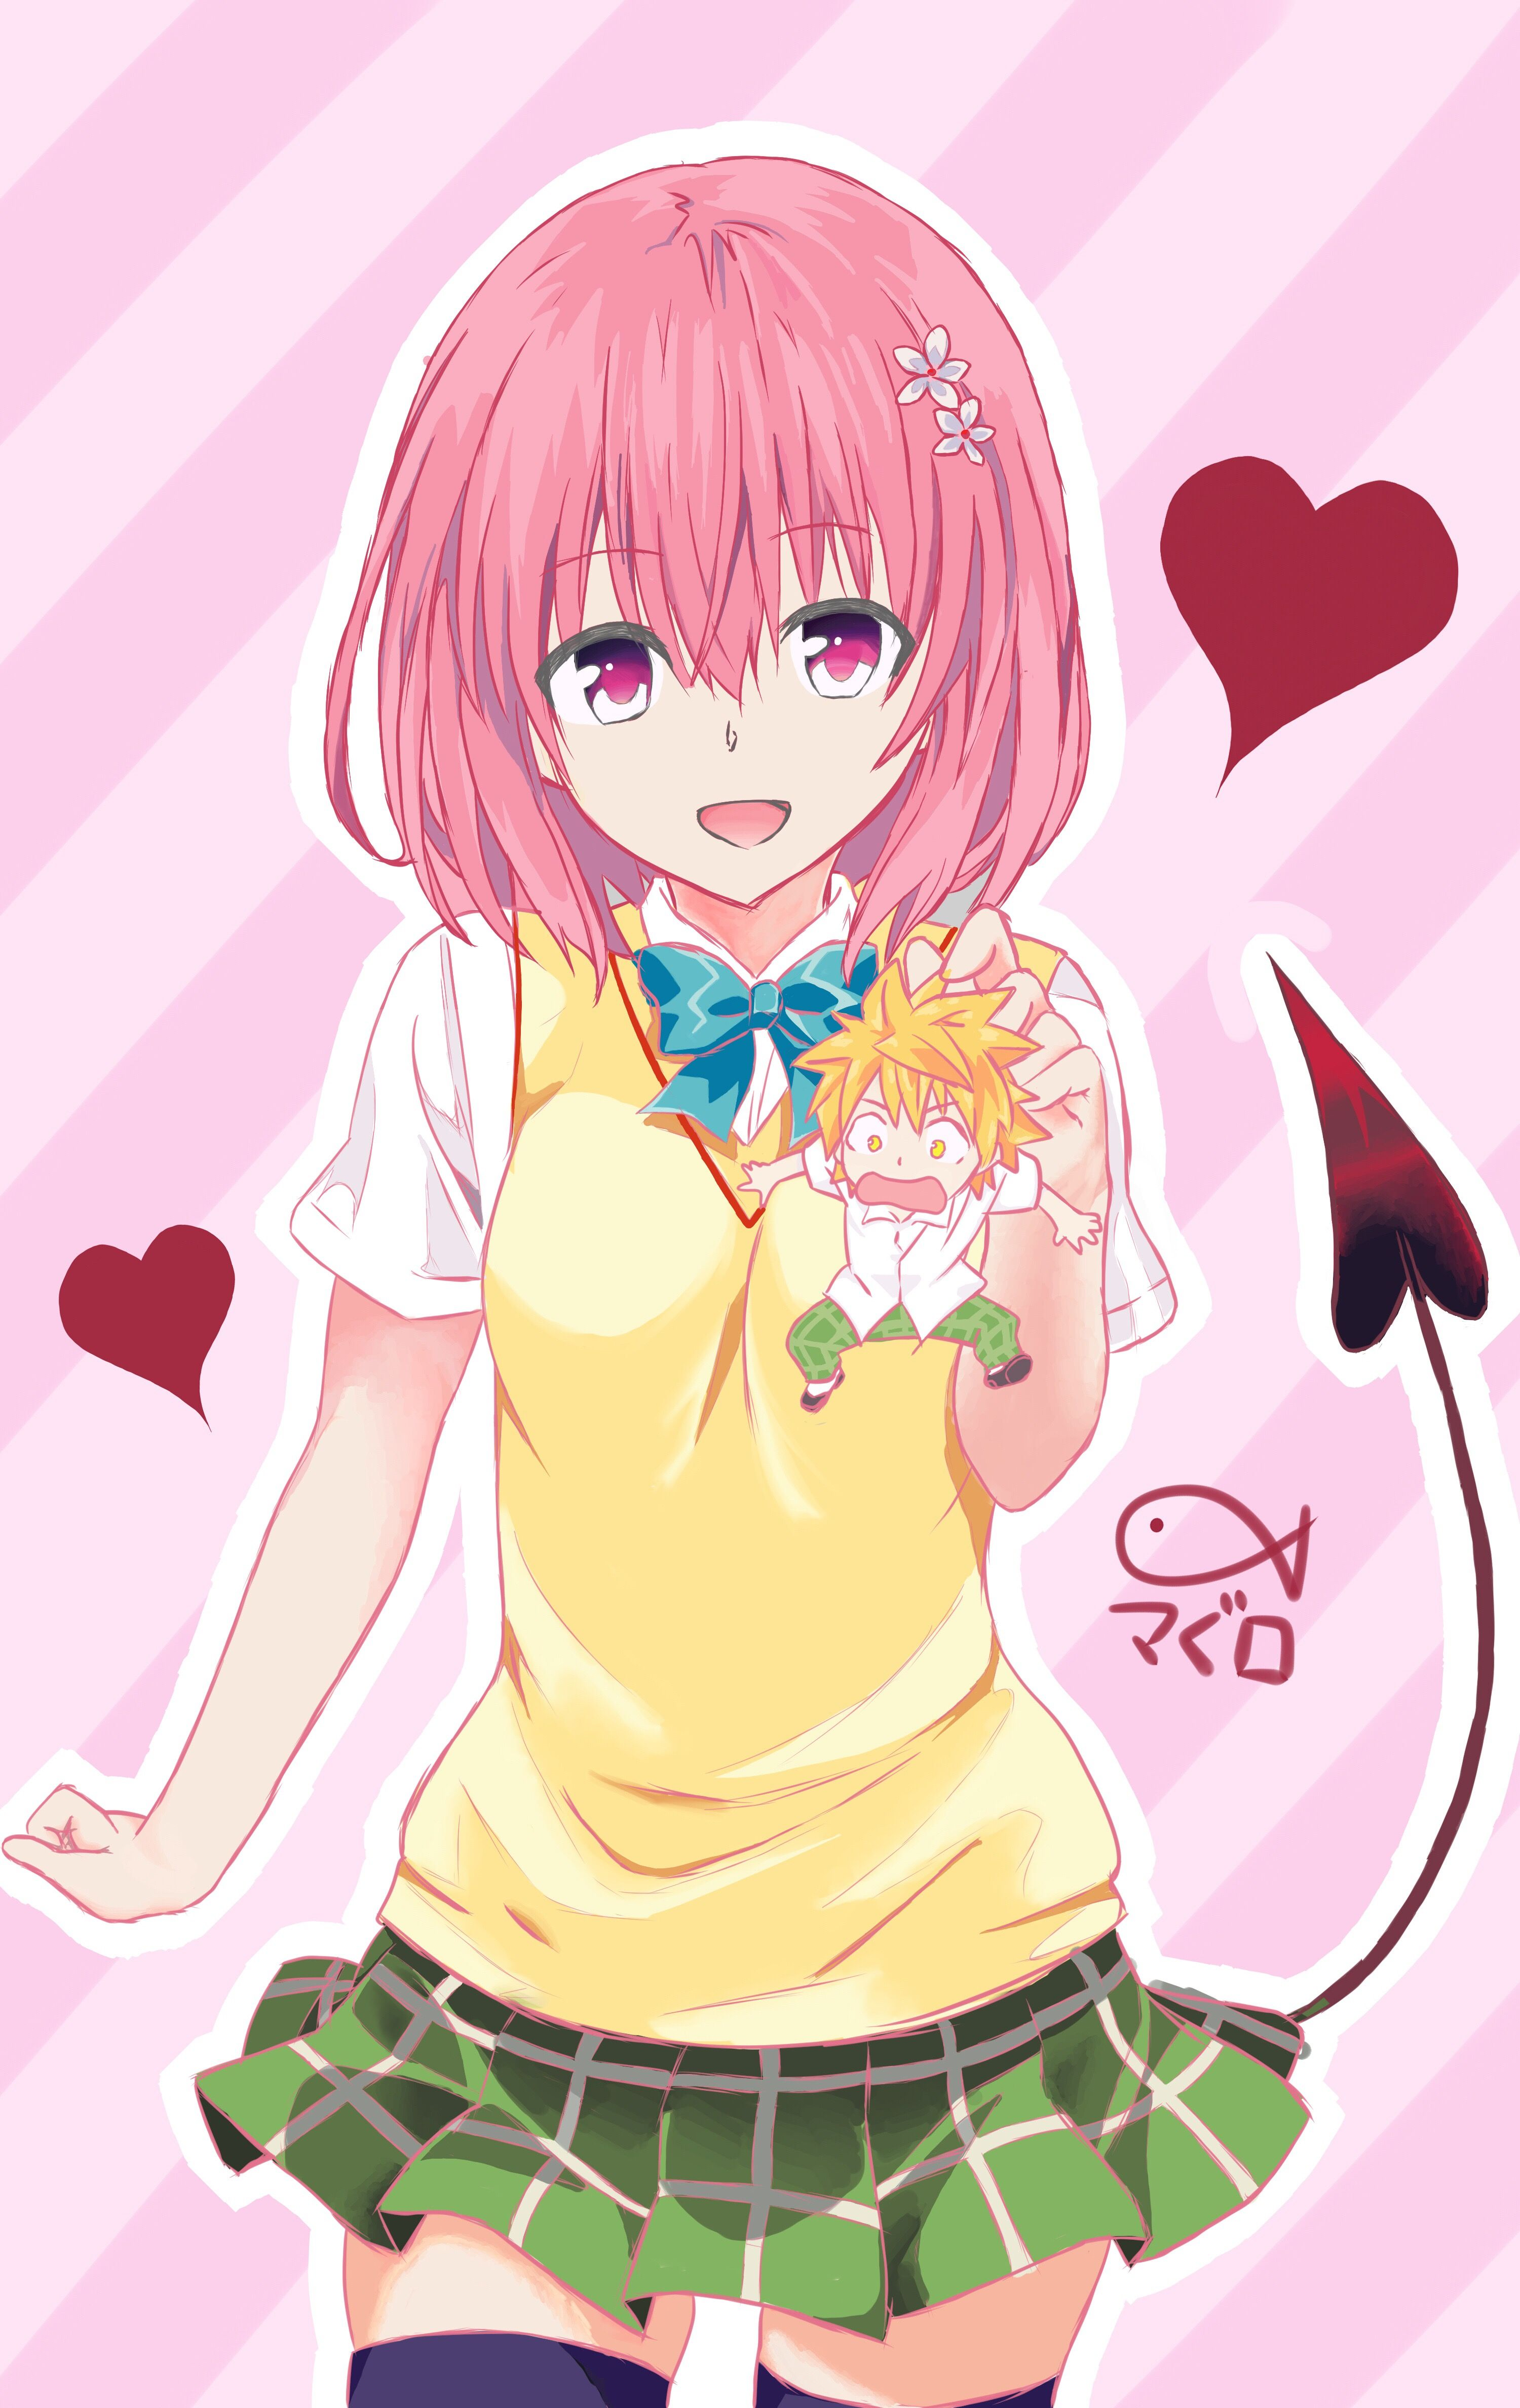 Anime Comic Momo Deviluke おしゃれまとめの人気アイデア